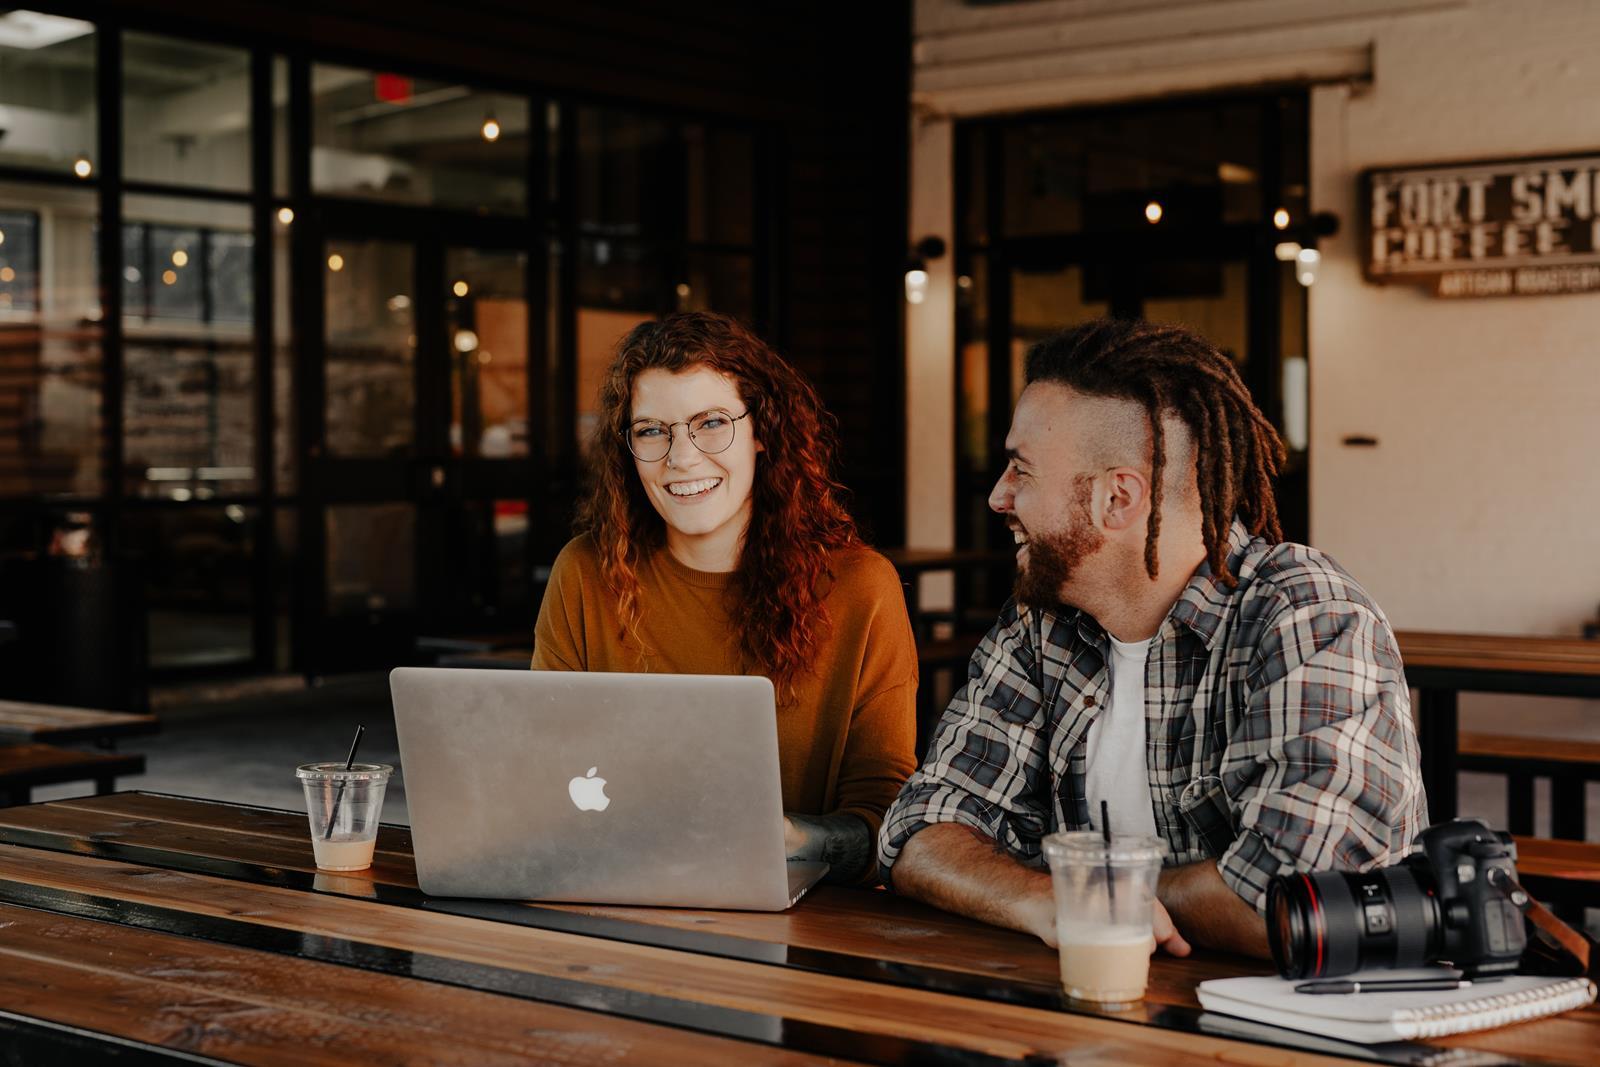 Marketing Strategies That Work on the Internet